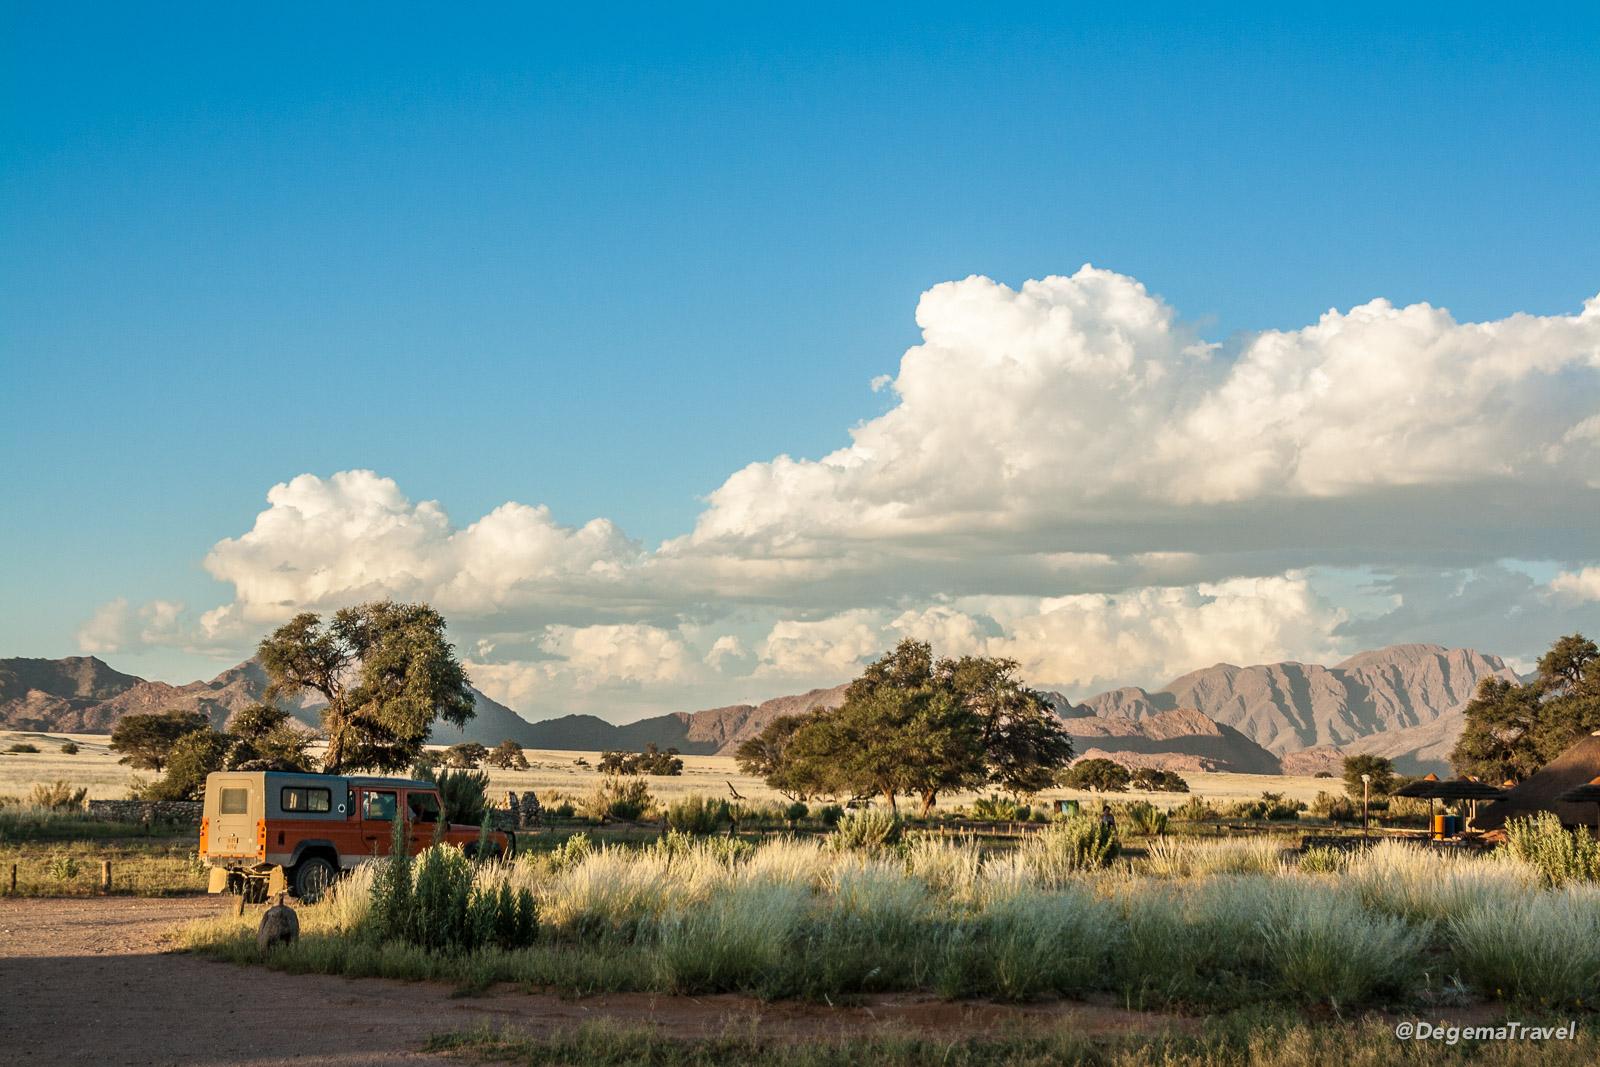 Our campsite near Sesriem, Namibia